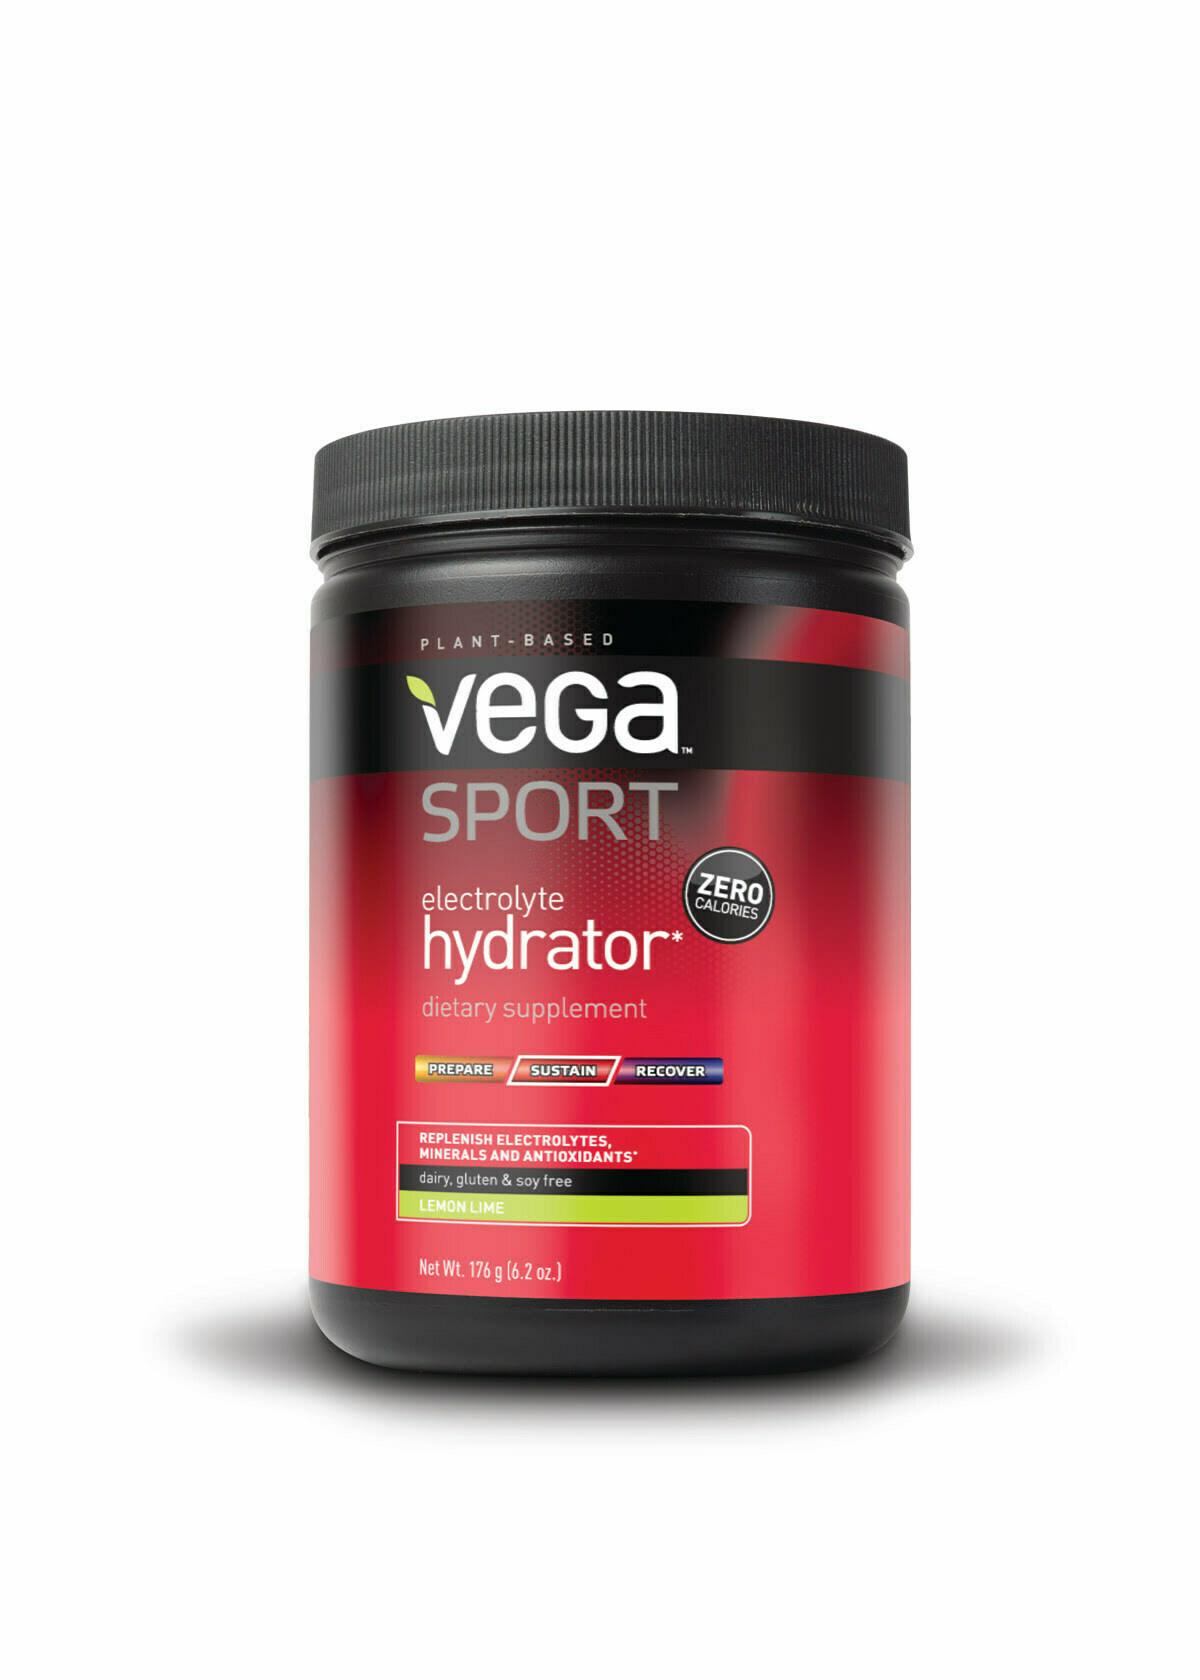 Vega Sport Electrolyte Hydrator 5 2oz Tub 40 Servings